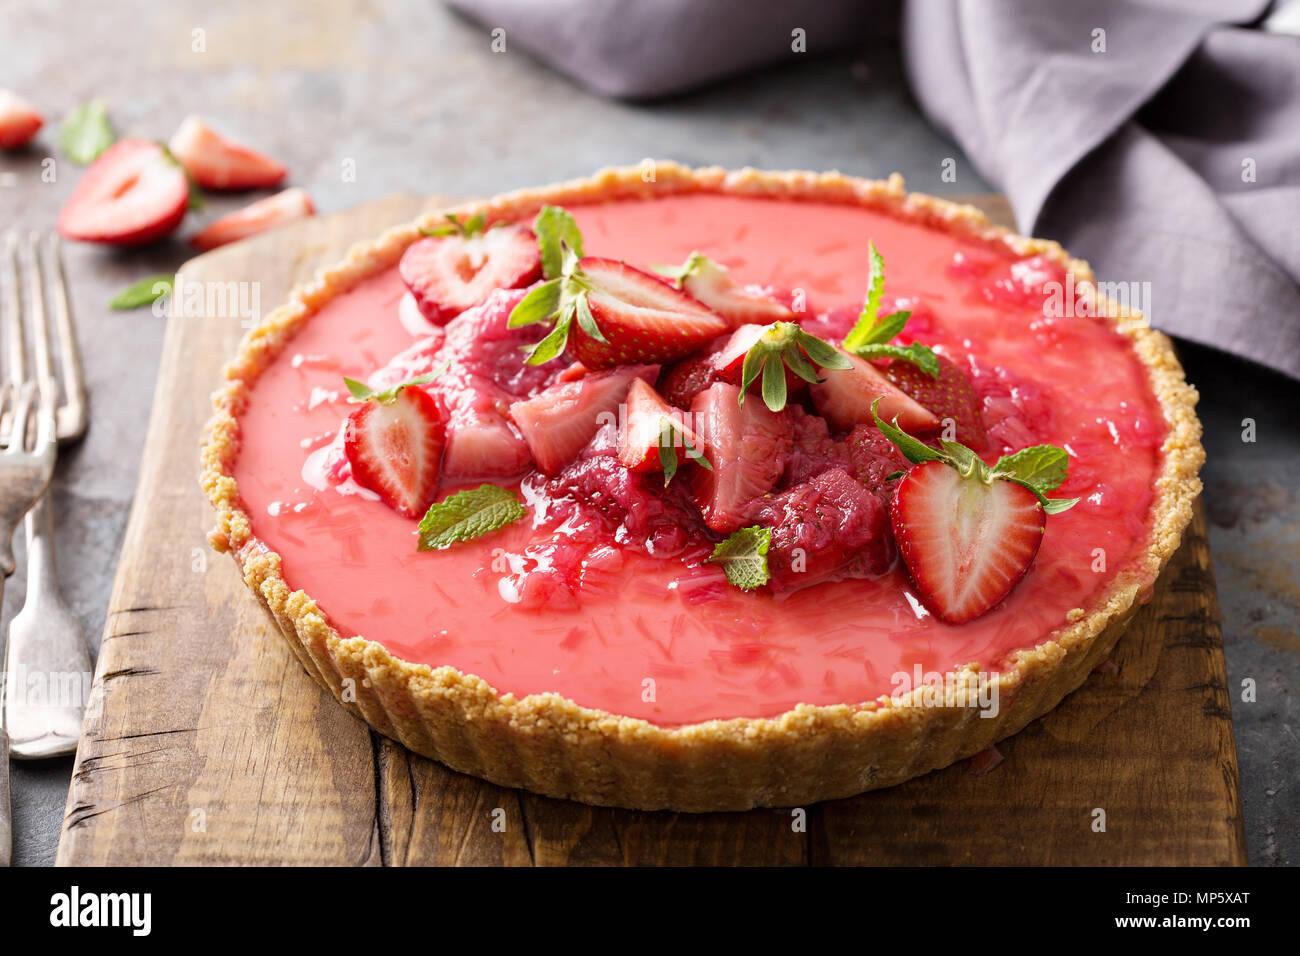 Yogurt tart with rhubarb strawberry compote - Stock Image